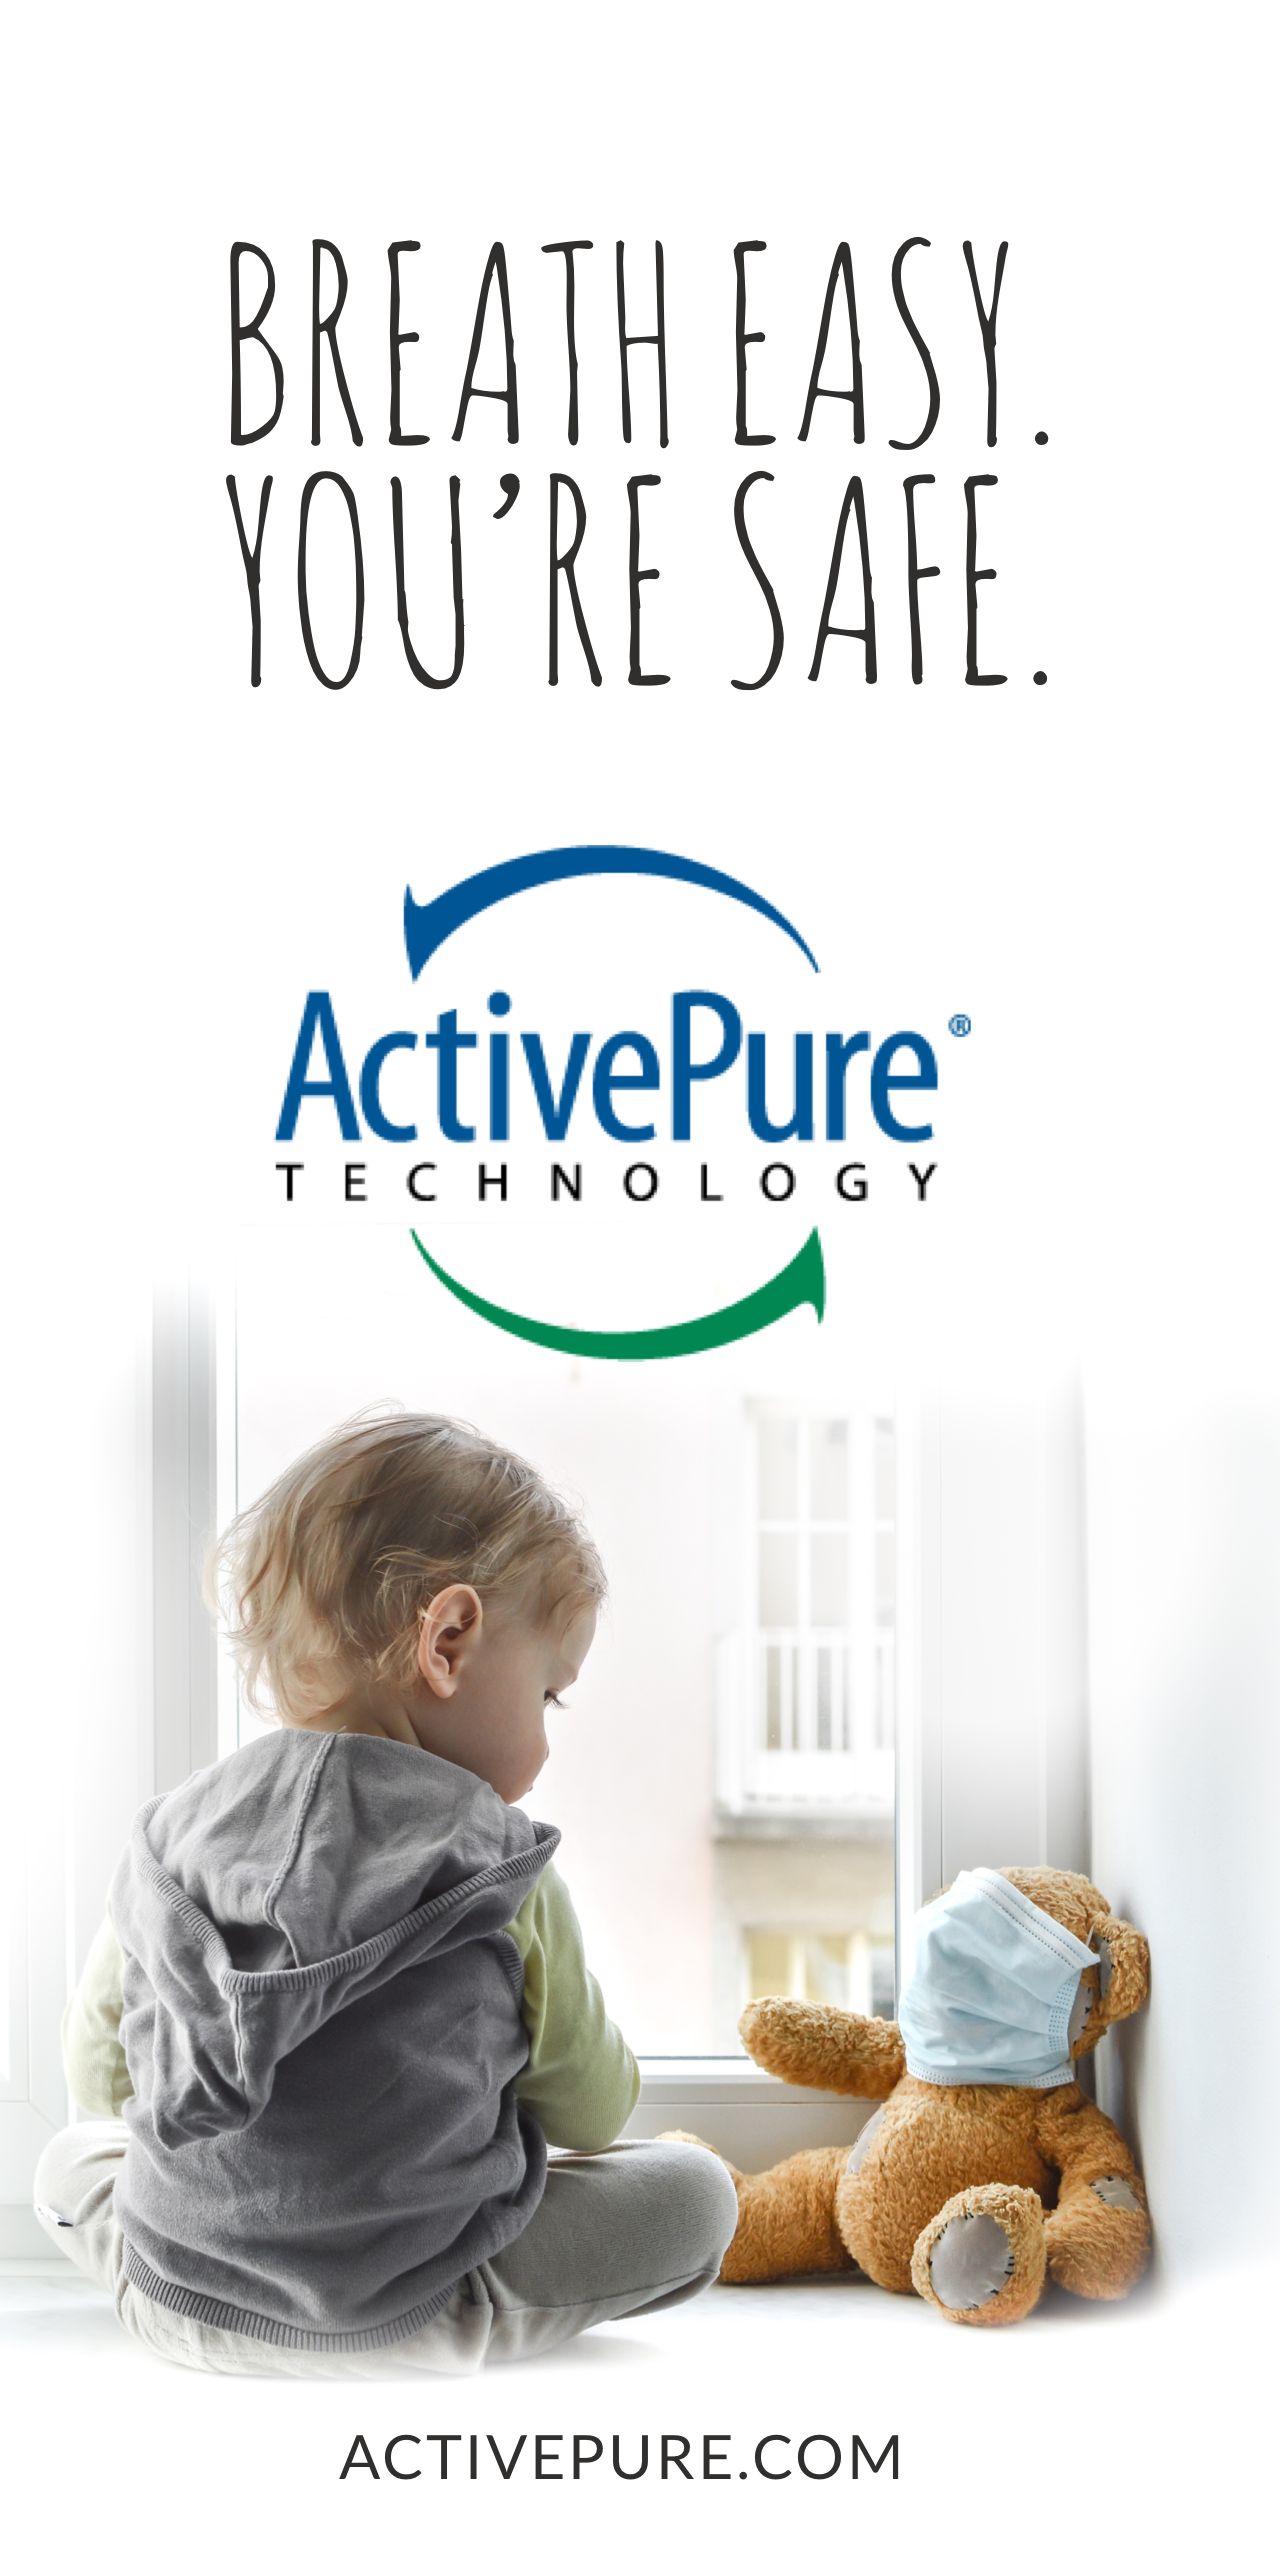 Pin on ActivePure Technology